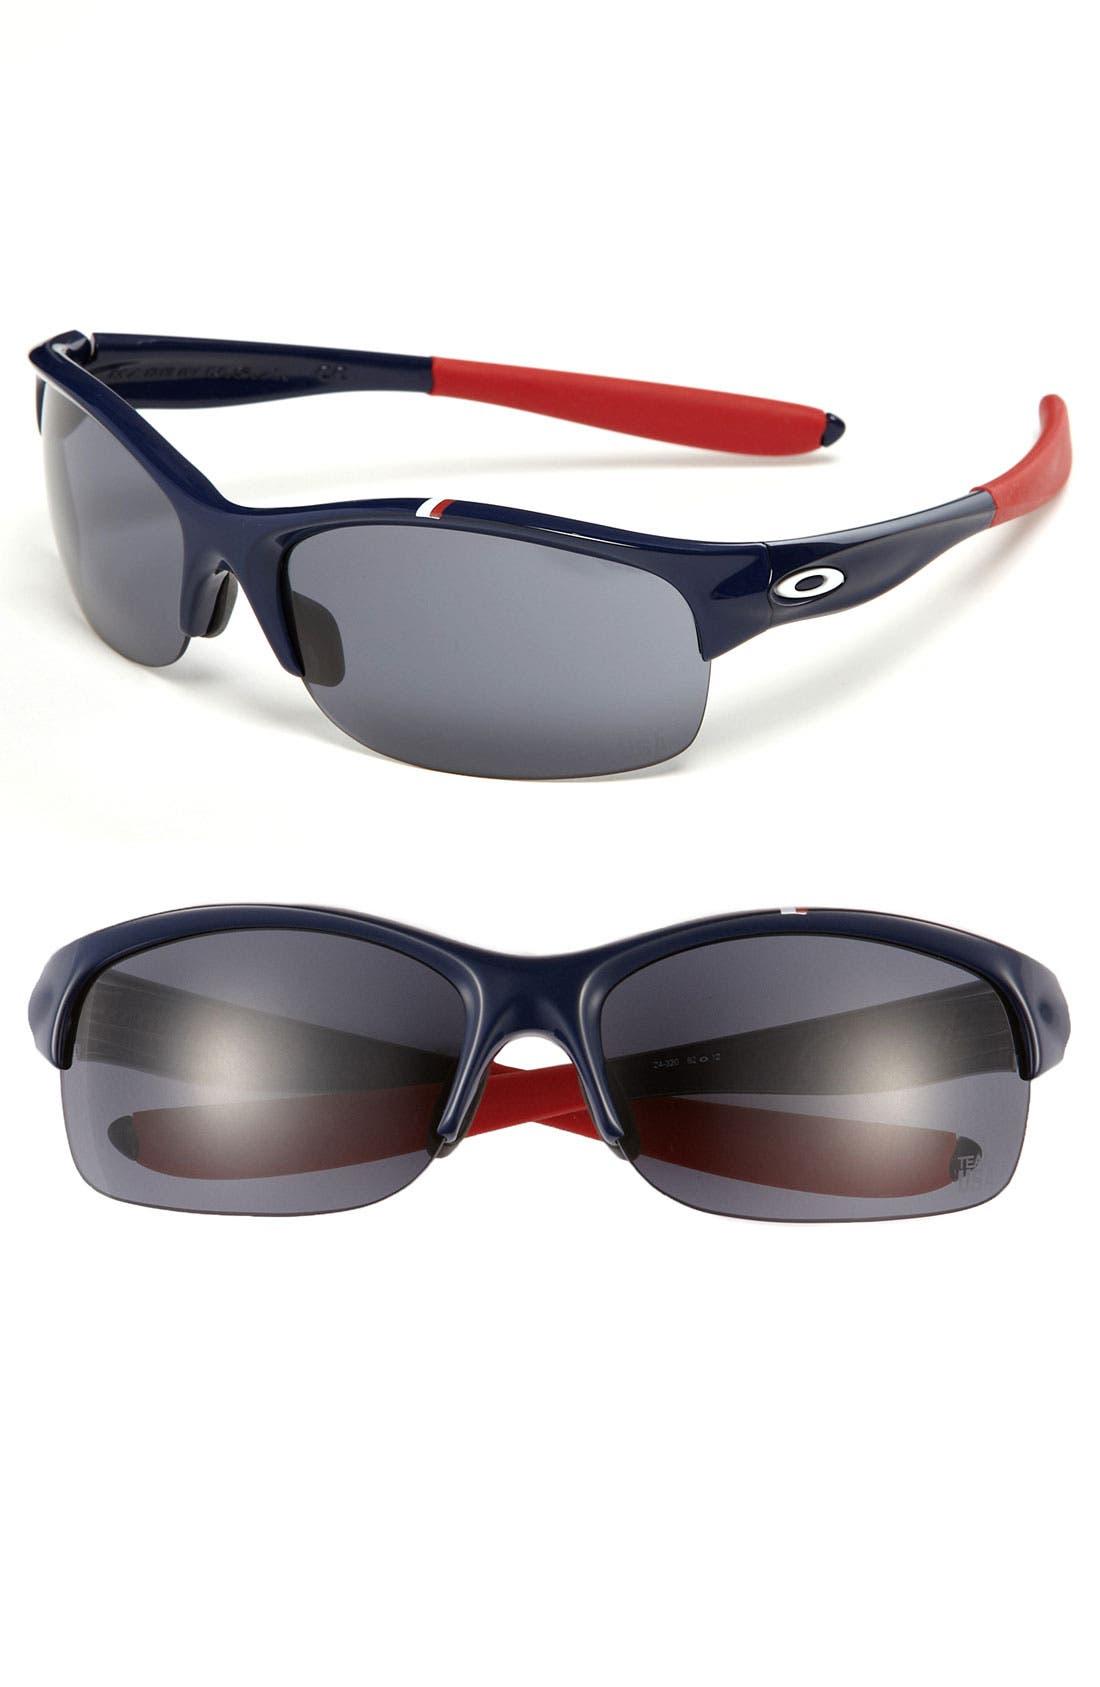 Main Image - Oakley 'Commit™ - Team USA' Sunglasses